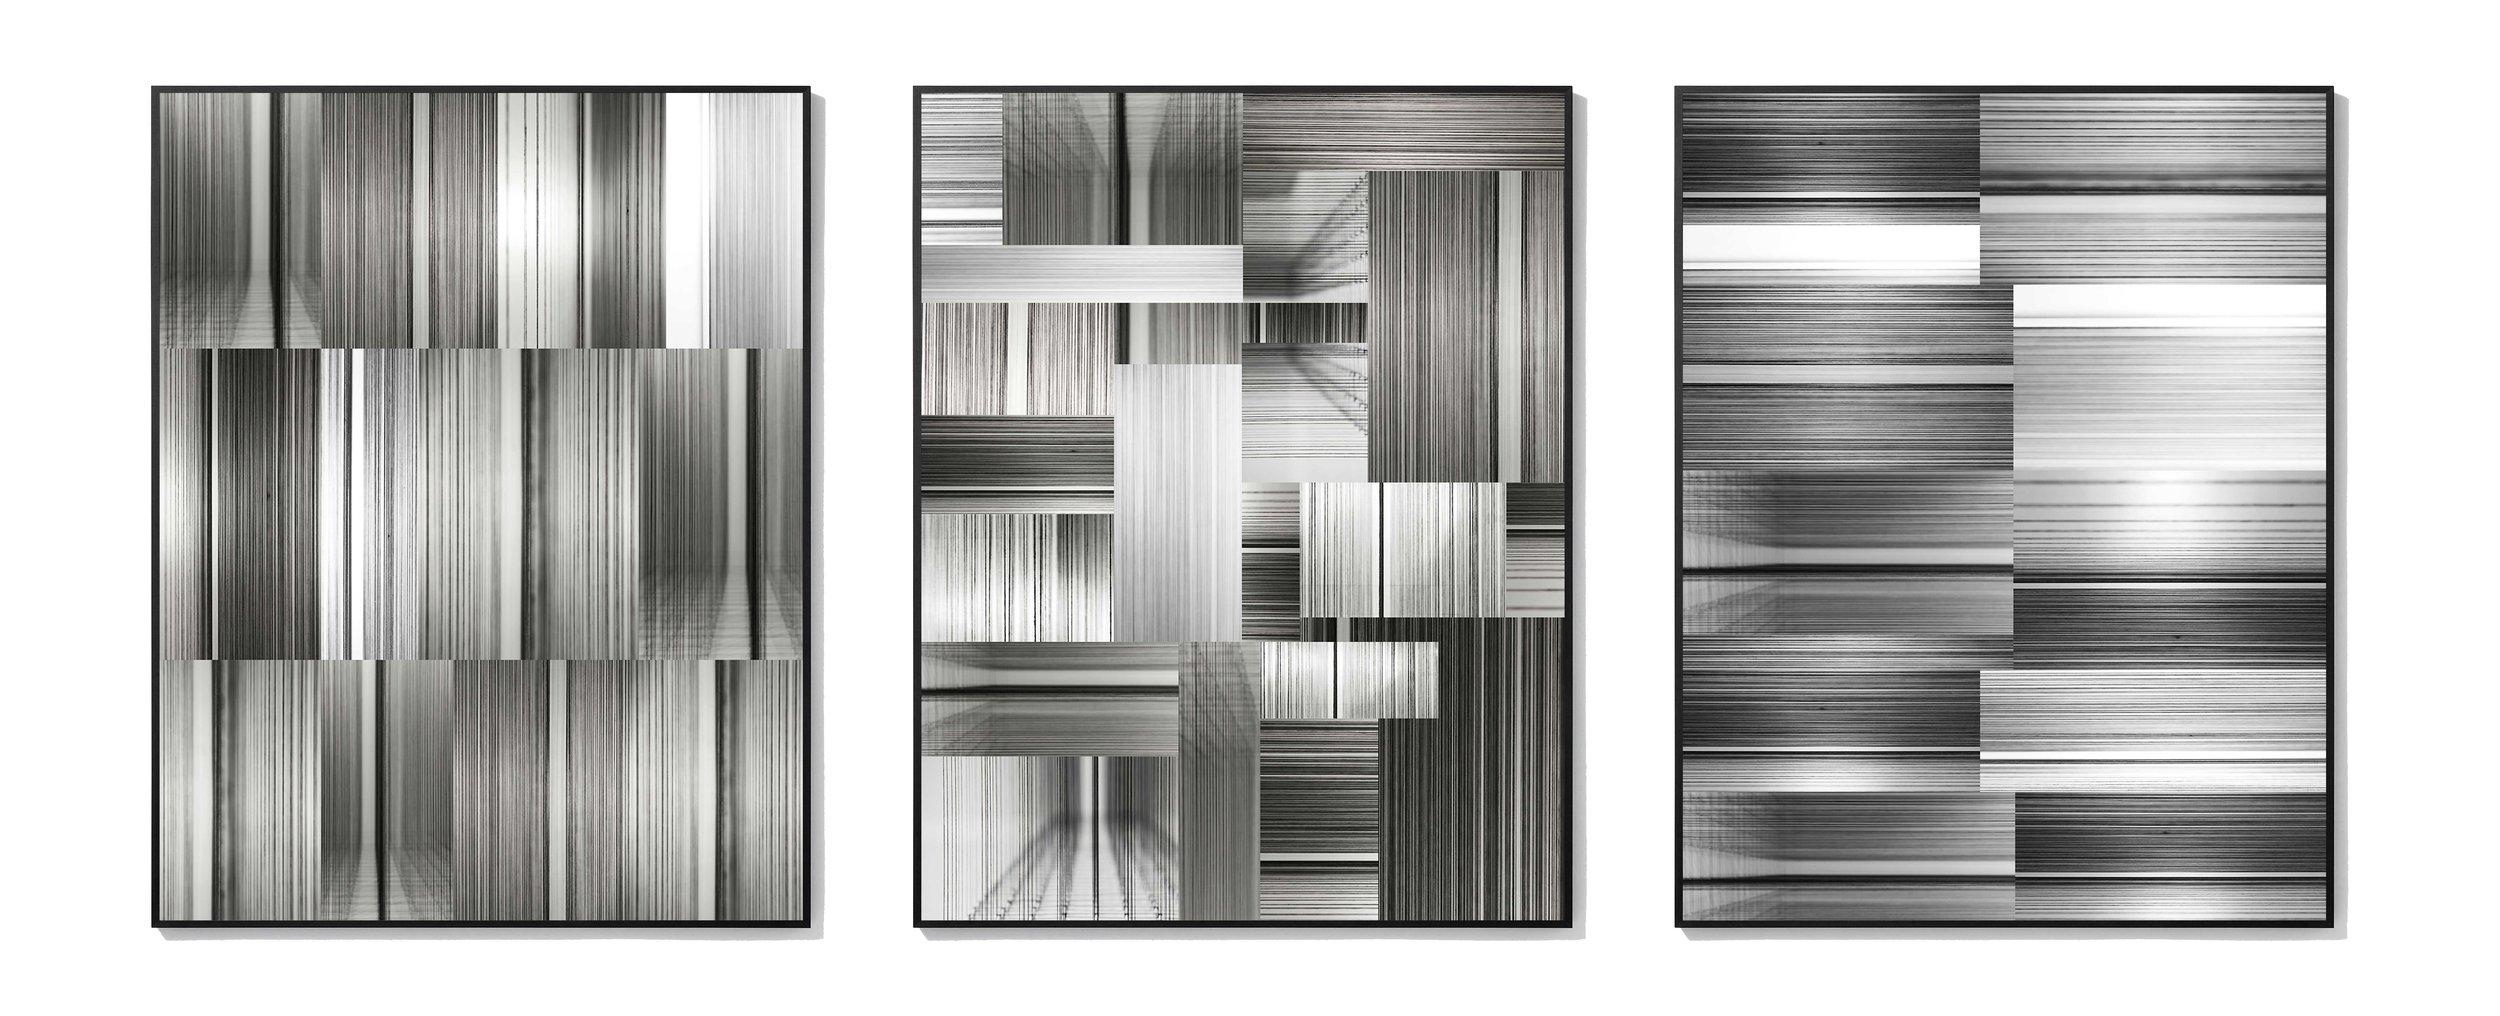 EunHye-Kang_Sequence-No.05,06,07_Digital-Collage_70x90(cm)each_2017.jpg